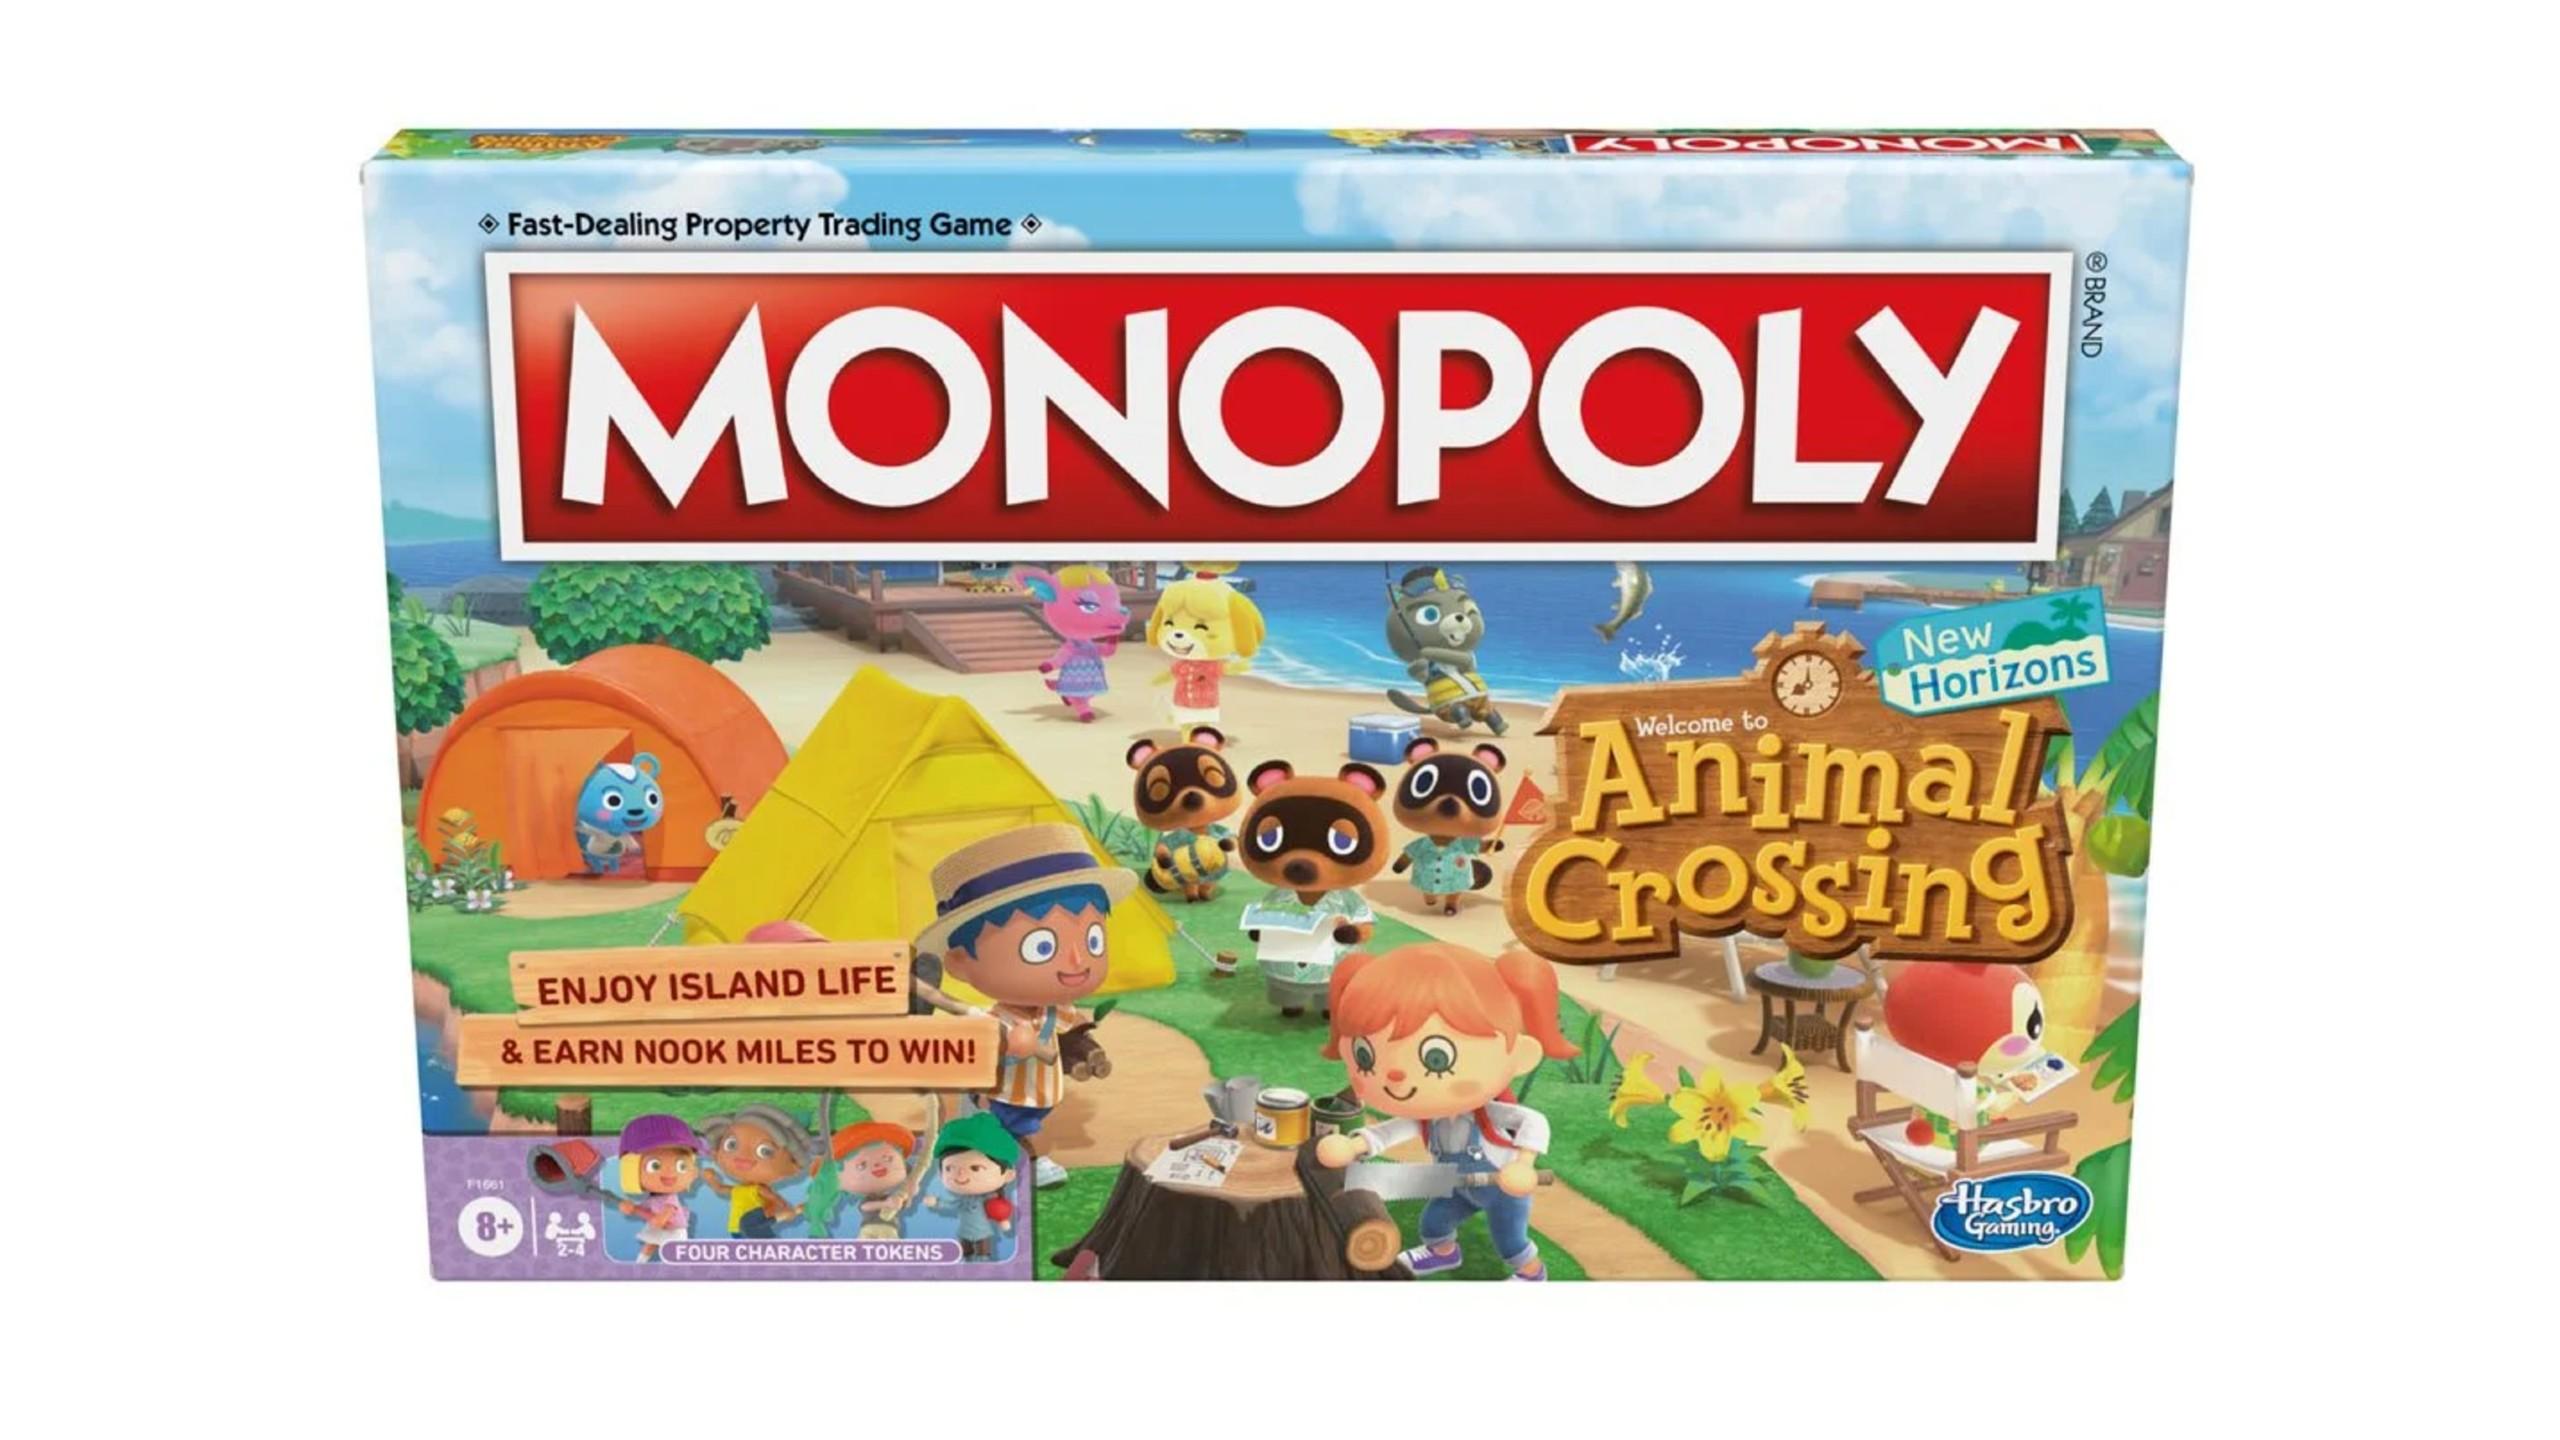 Animal Crossing New Horizons Monopoly